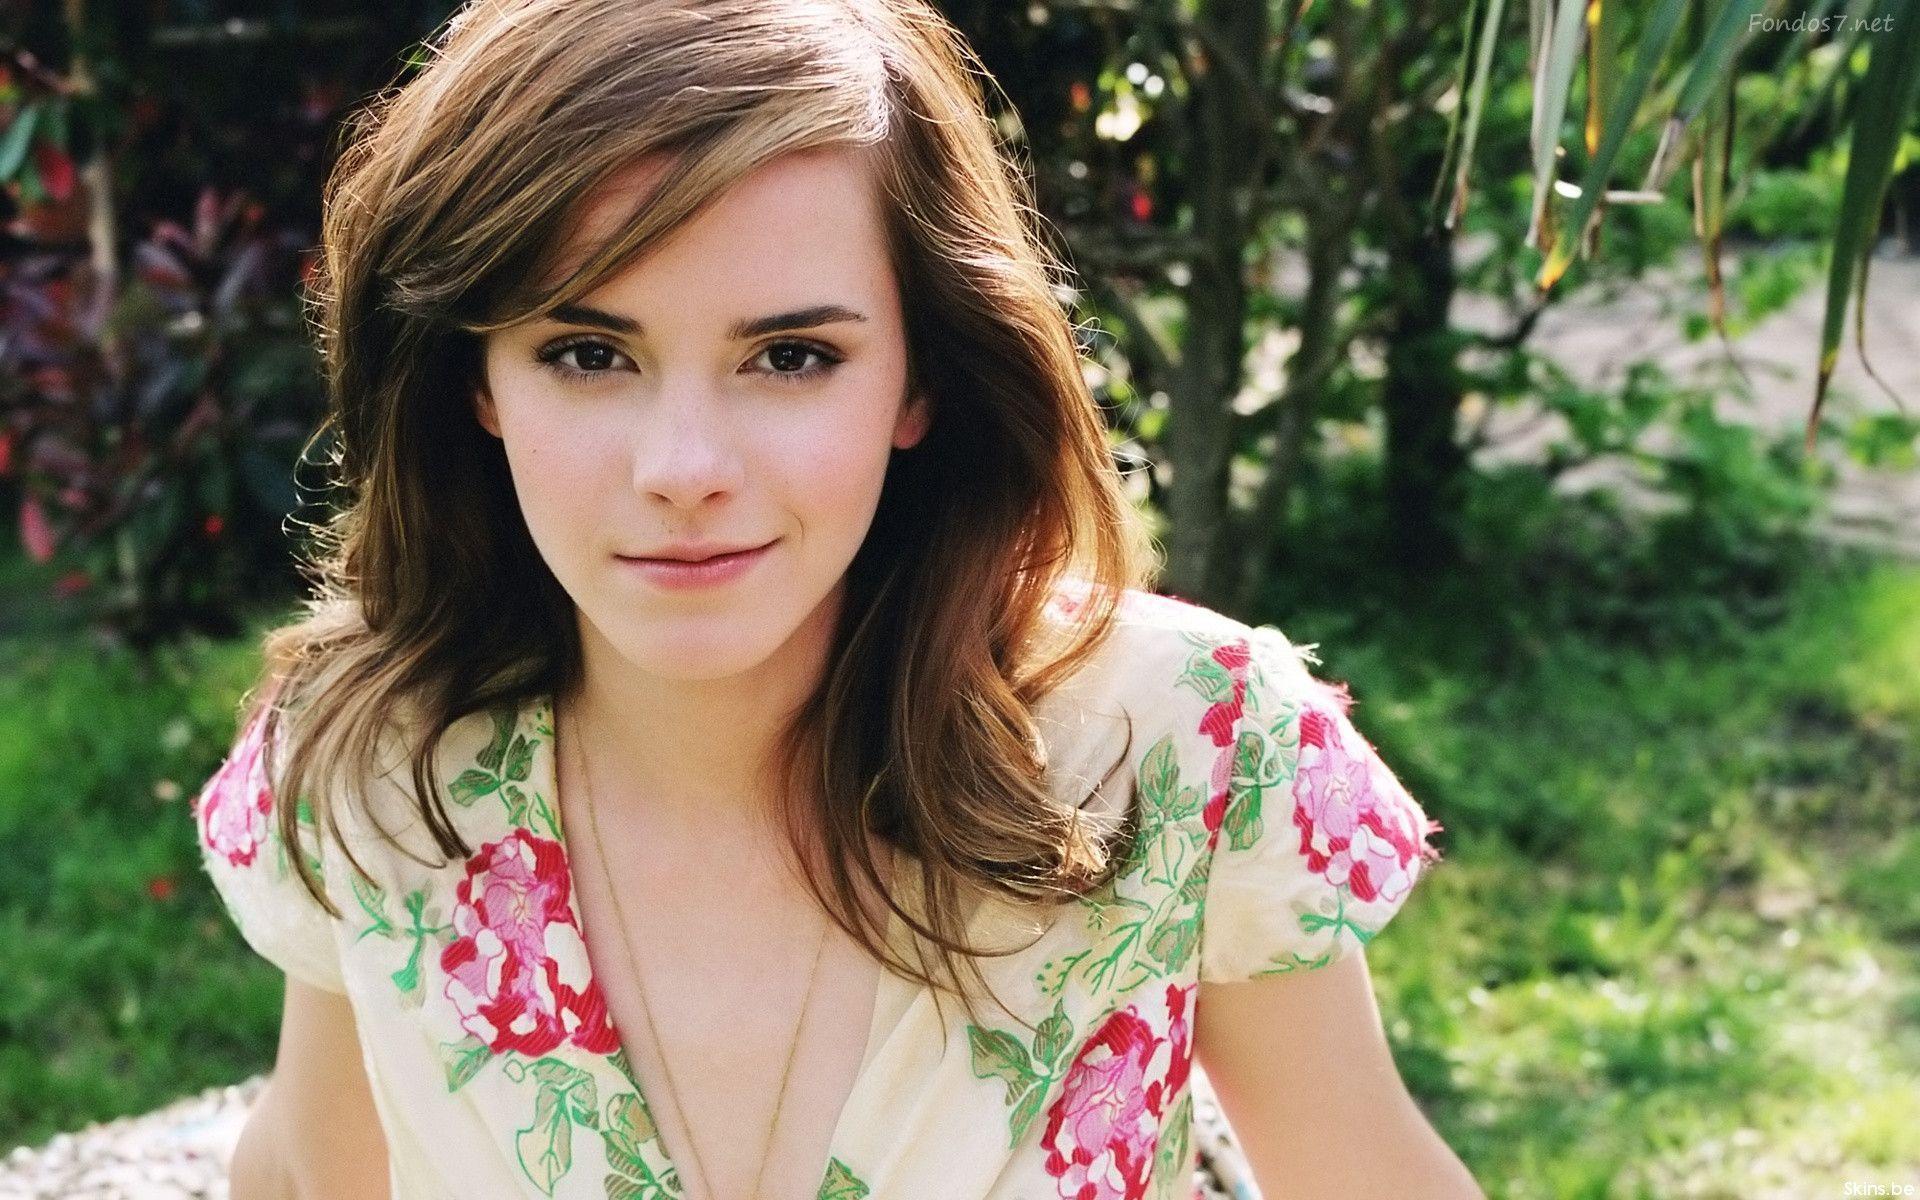 Hd wallpaper emma watson - Free Emma Watson Wallpapers Download Wallpapers Backgrounds